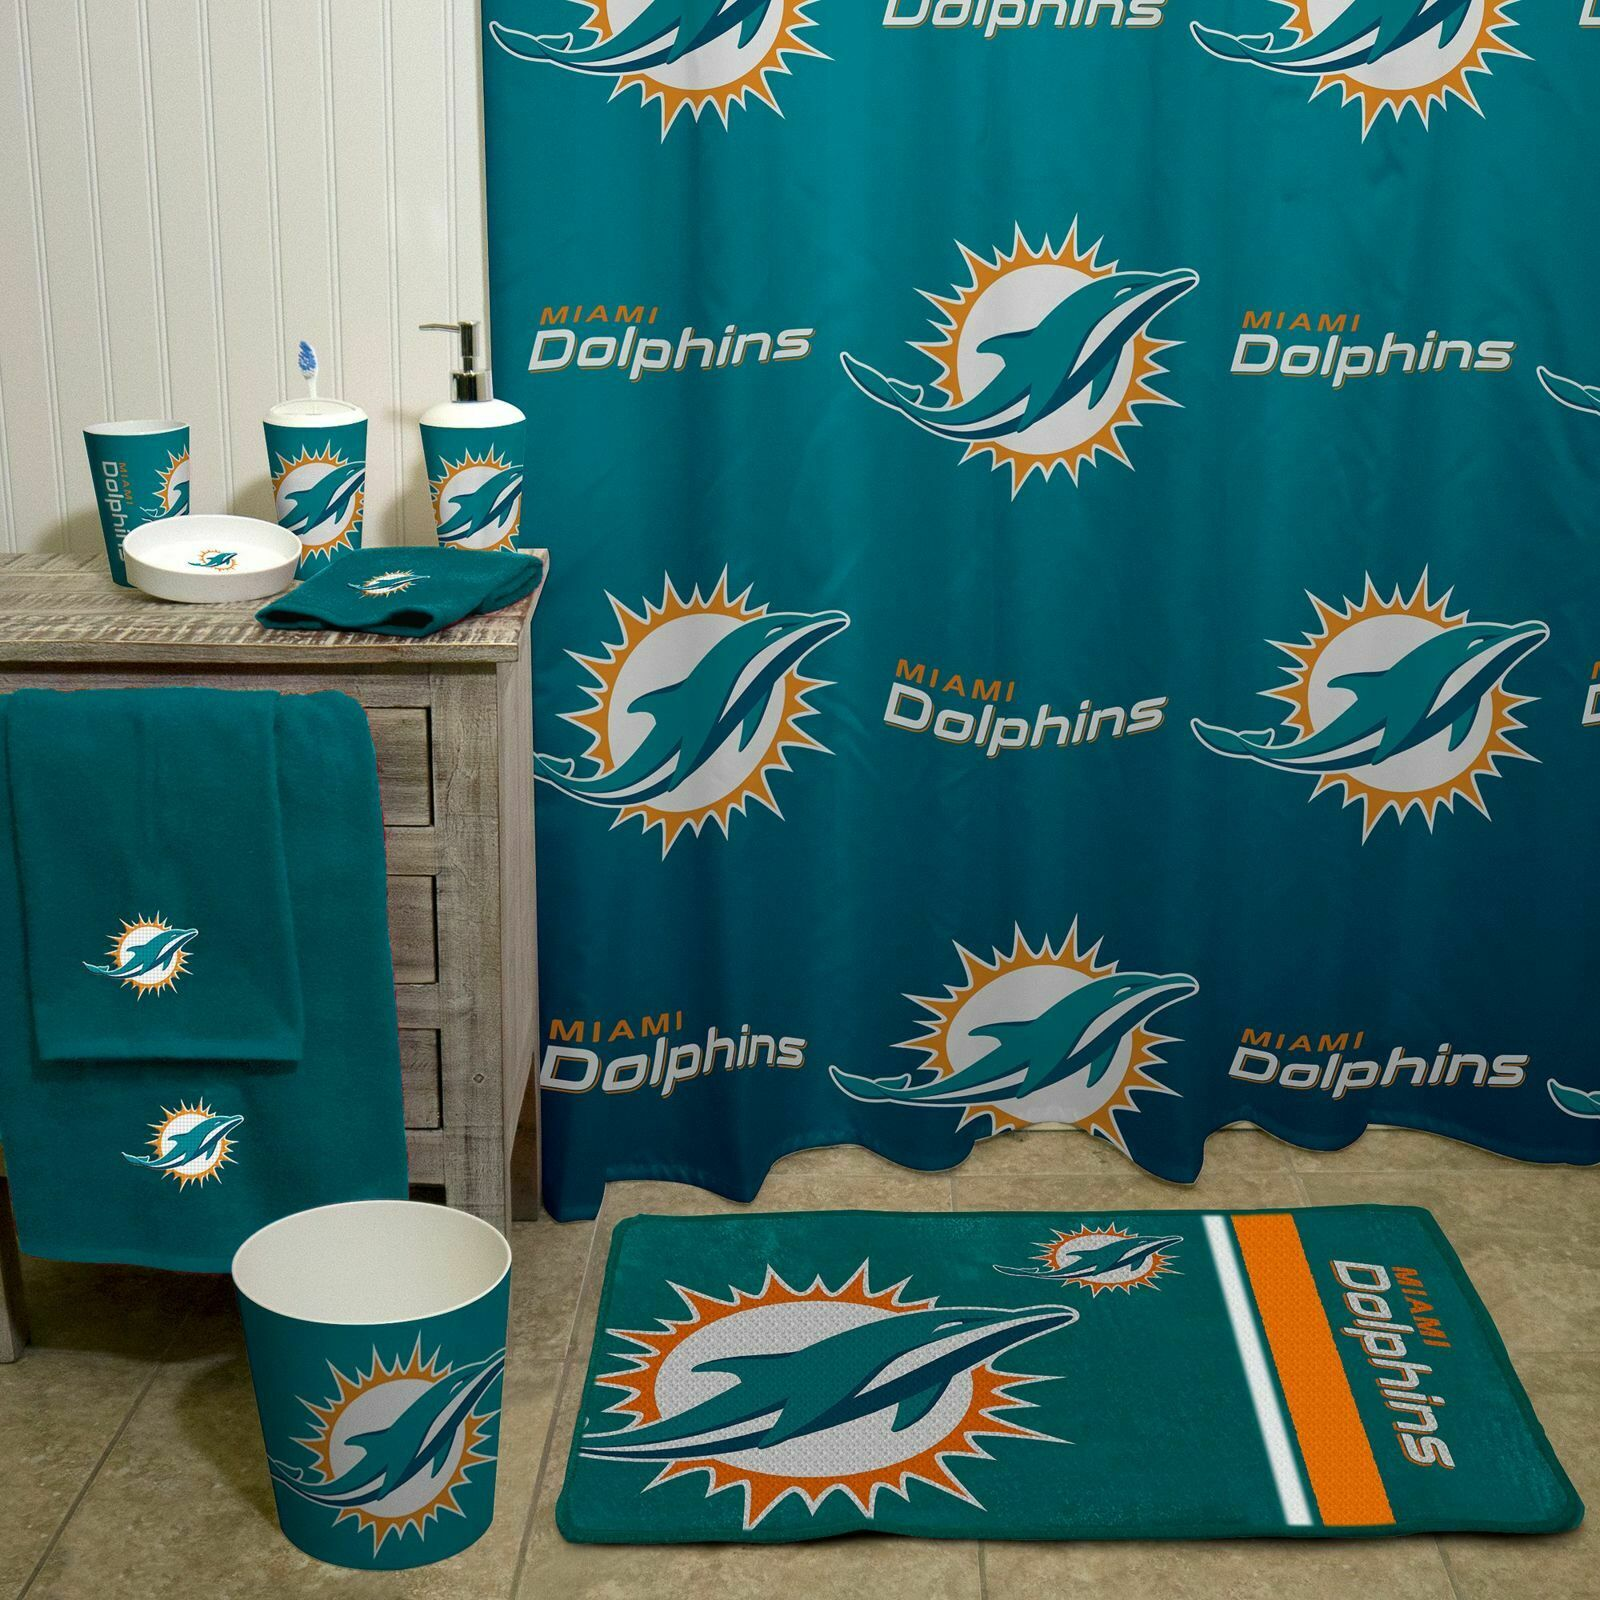 "Miami Dolphins Shower Curtain NFL 72"" x 72"" Bathroom Bath ..."